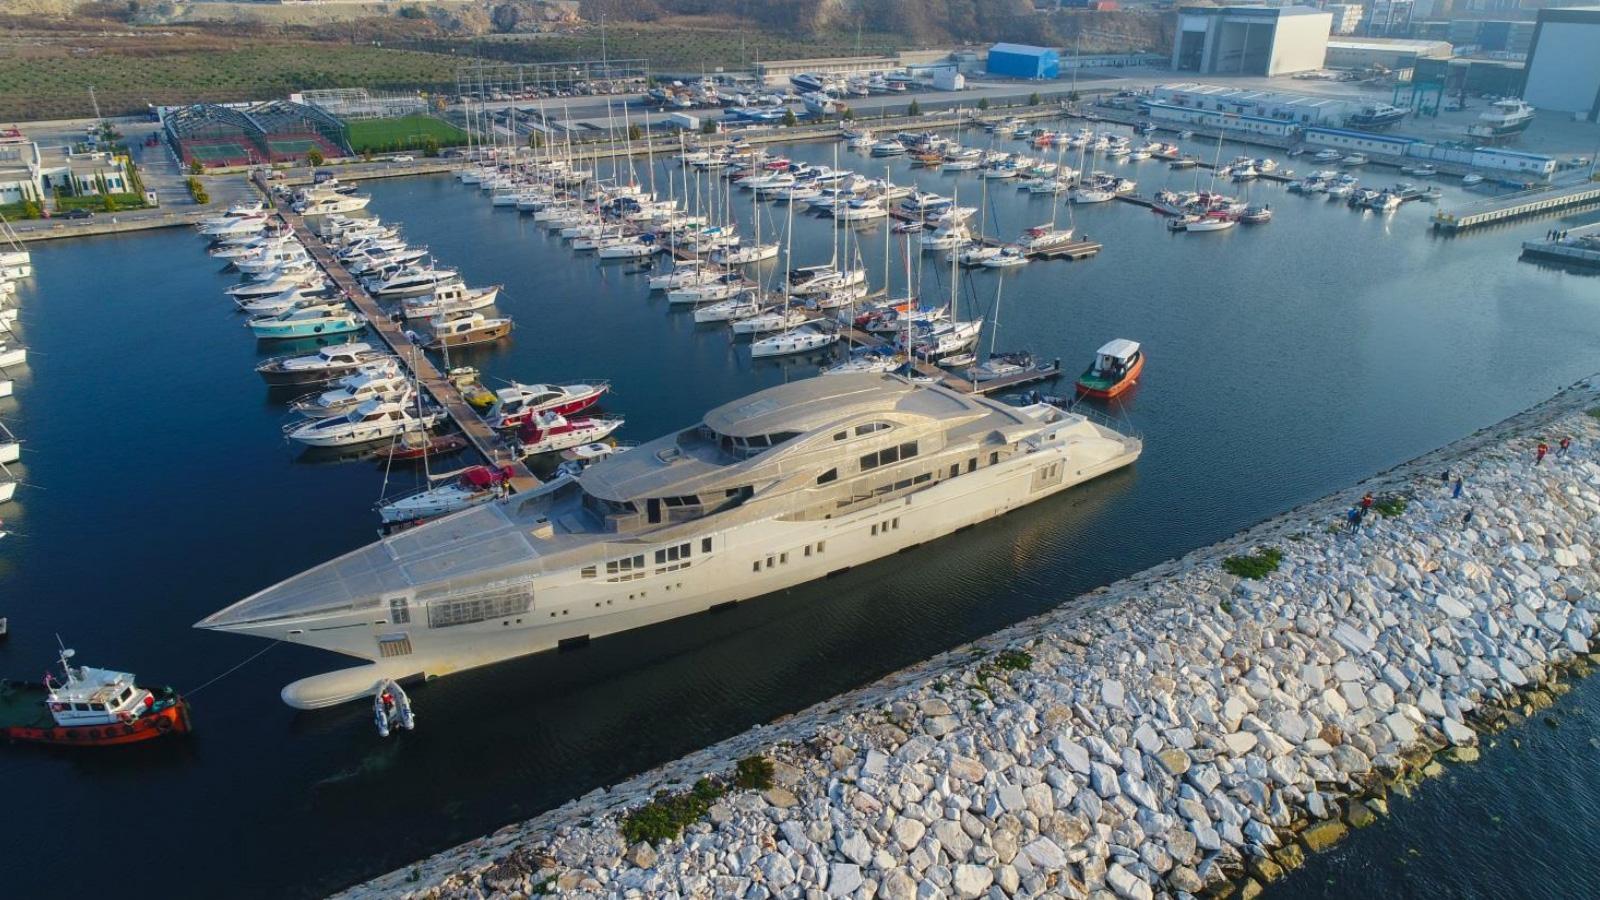 bilgin 263 motoryacht bilgin yacht 80m 2019 under construction aerial